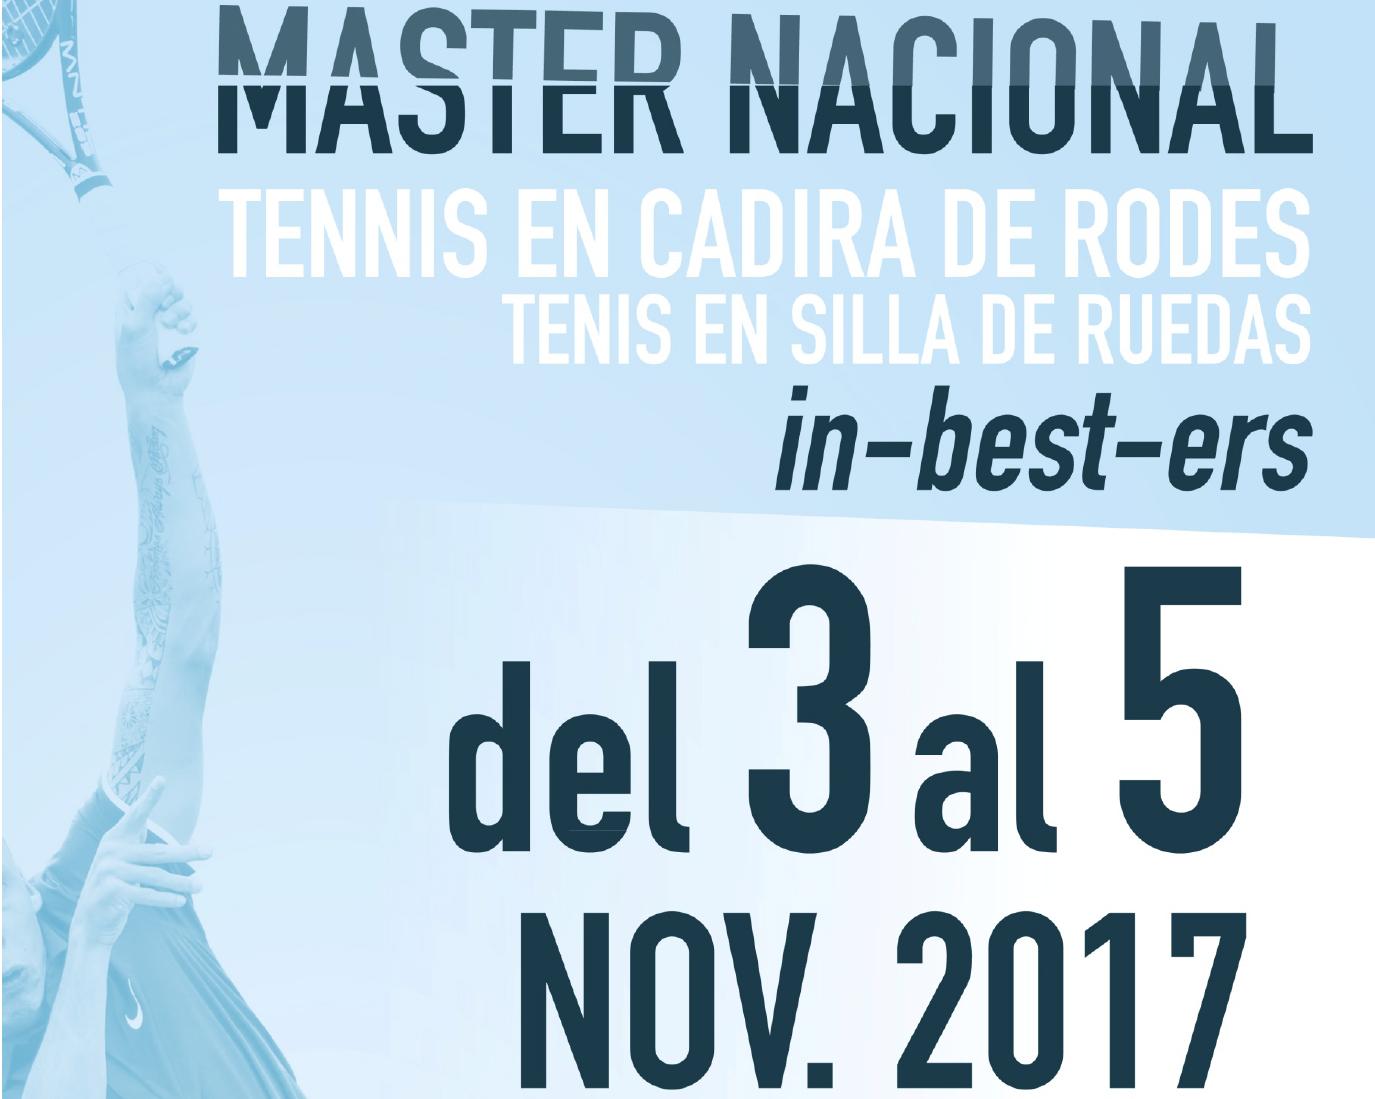 In-best-ers Patrocina El Màster Nacional De Tennis En Cadira De Rodes